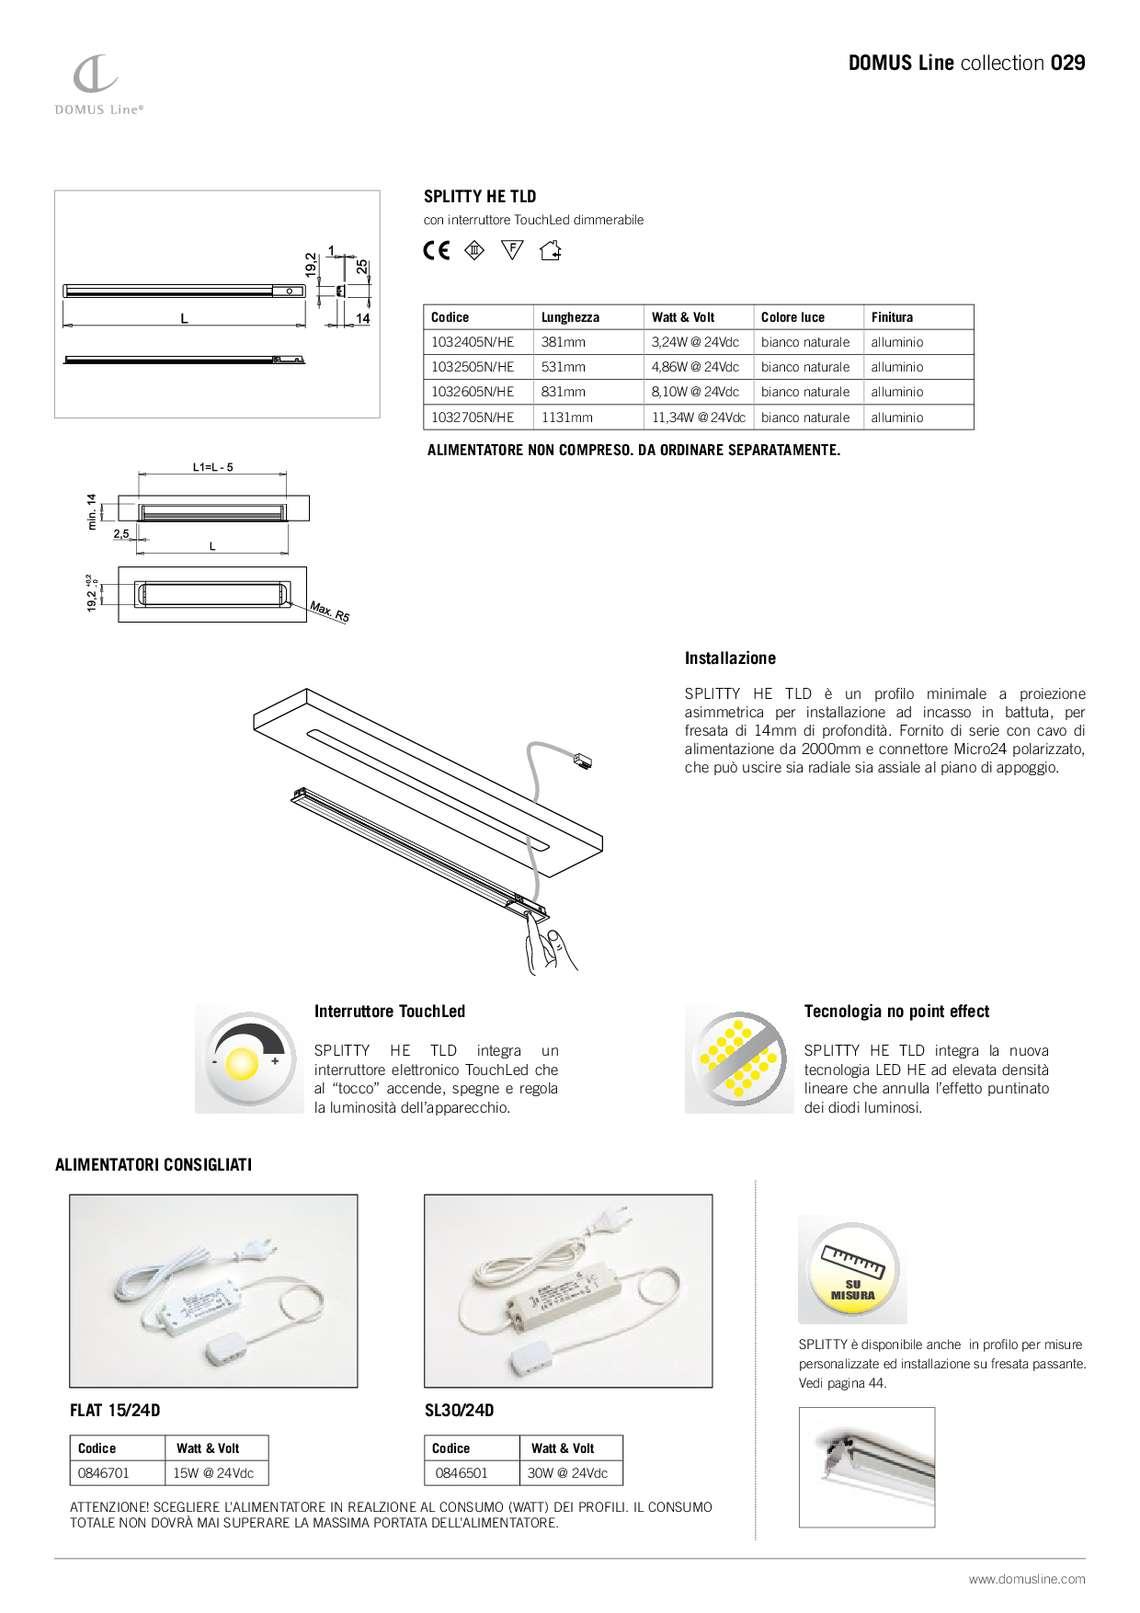 domus-line-illuminazione_26_029.jpg